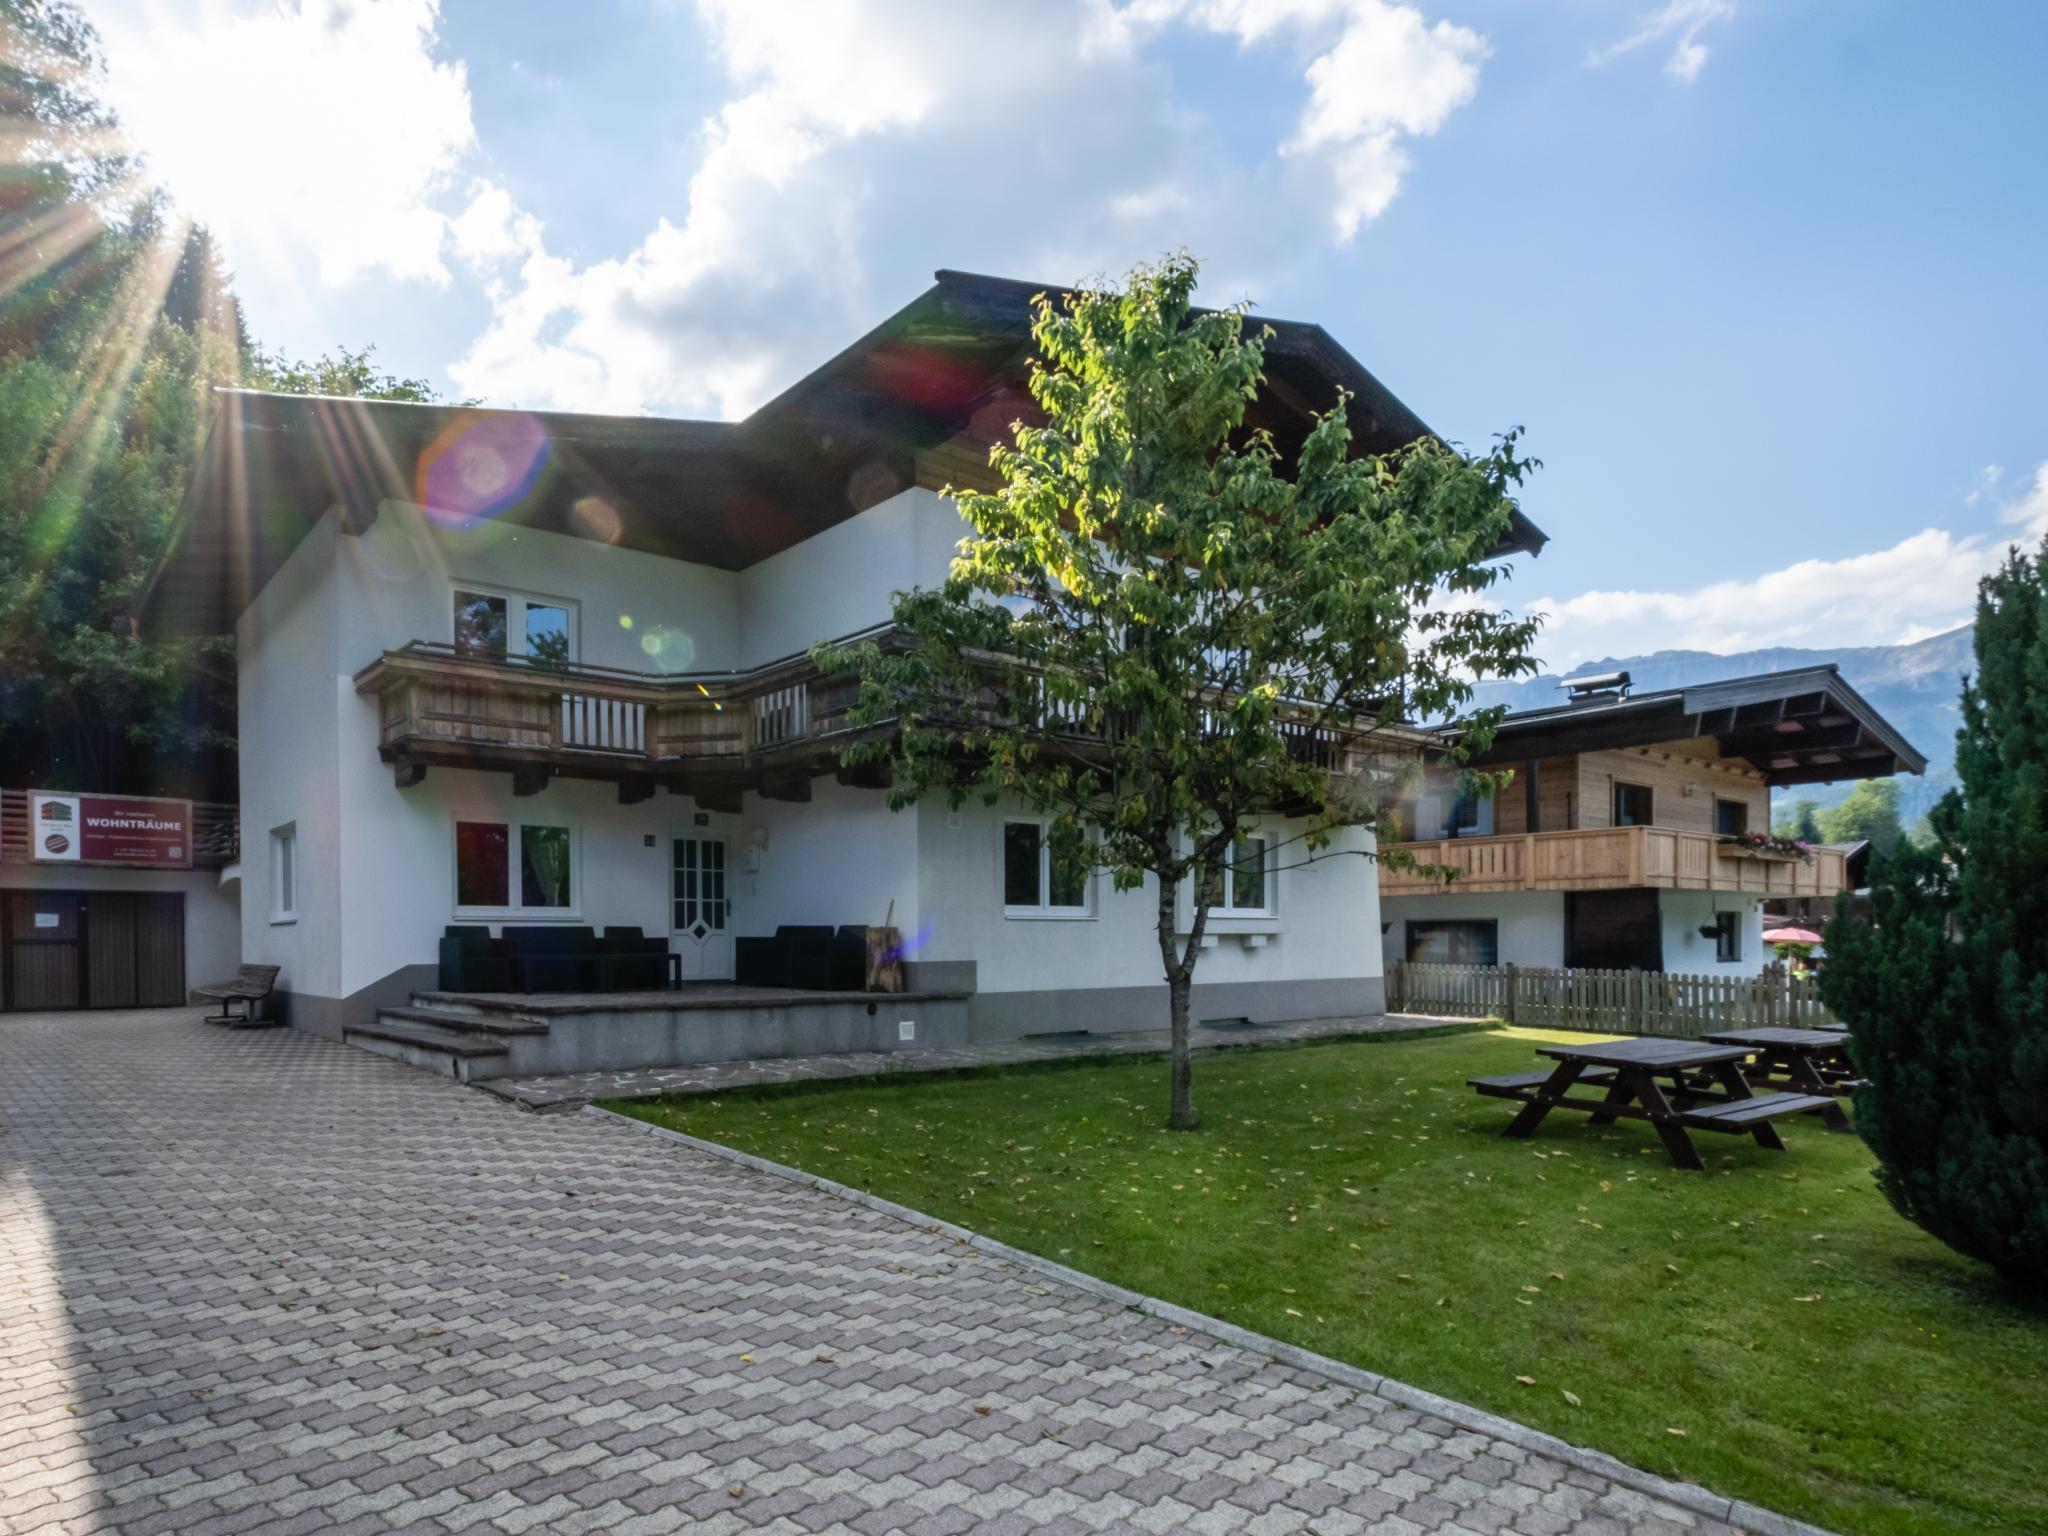 Hartkaiserblick Tirol